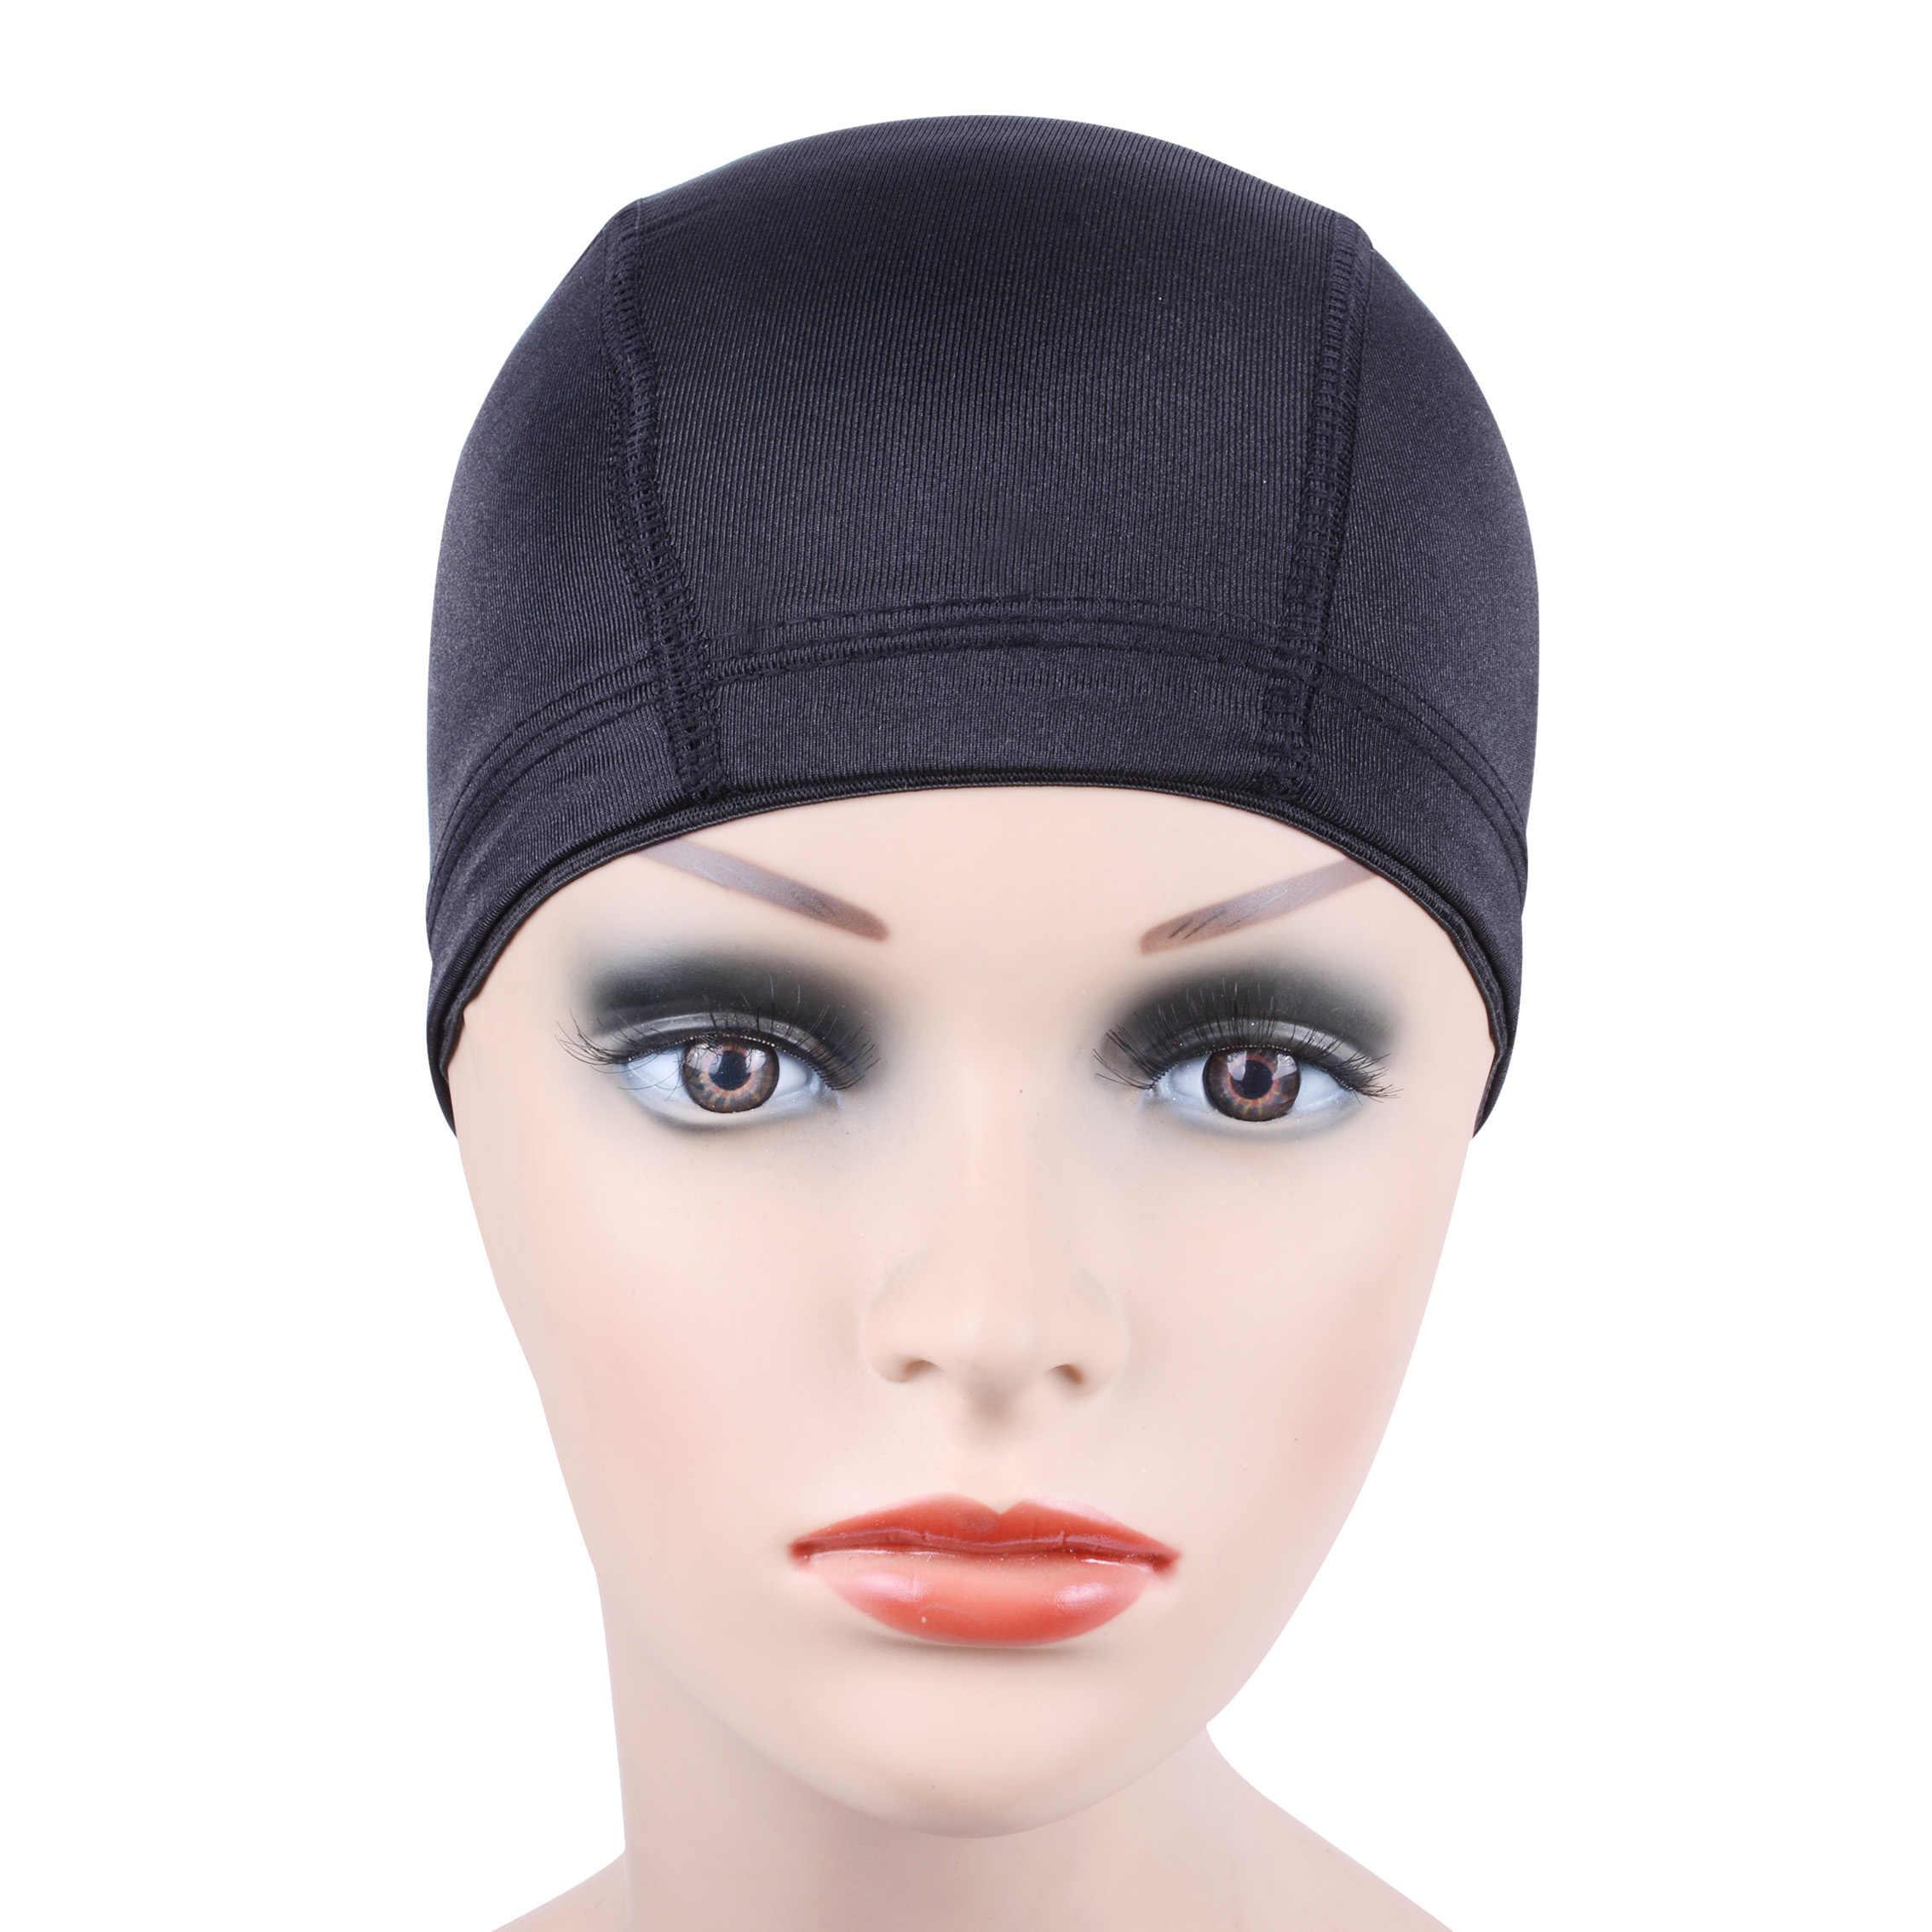 1 pc glueless cabelo líquido peruca forro barato peruca tampas para fazer perucas elastano net elástico cúpula peruca boné